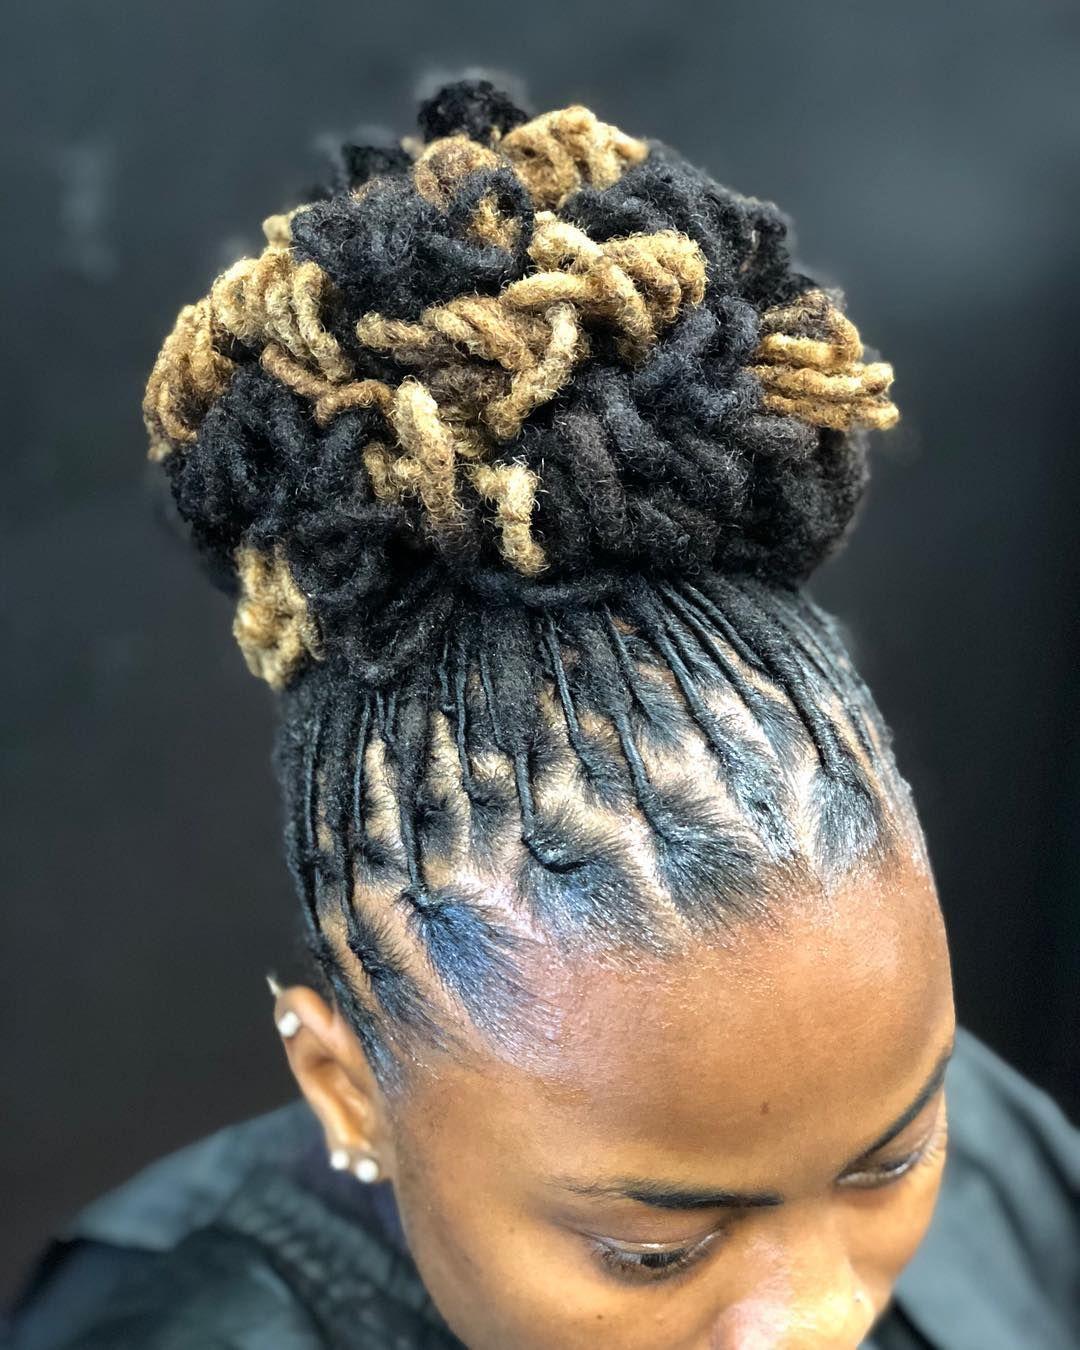 Janai On Instagram Petal Bun Done At Karibbeankinks Natural Hair Salon Text 301 996 1285 Loca Coiffure Cheveux Naturels Coiffure Afro Coiffures Locs